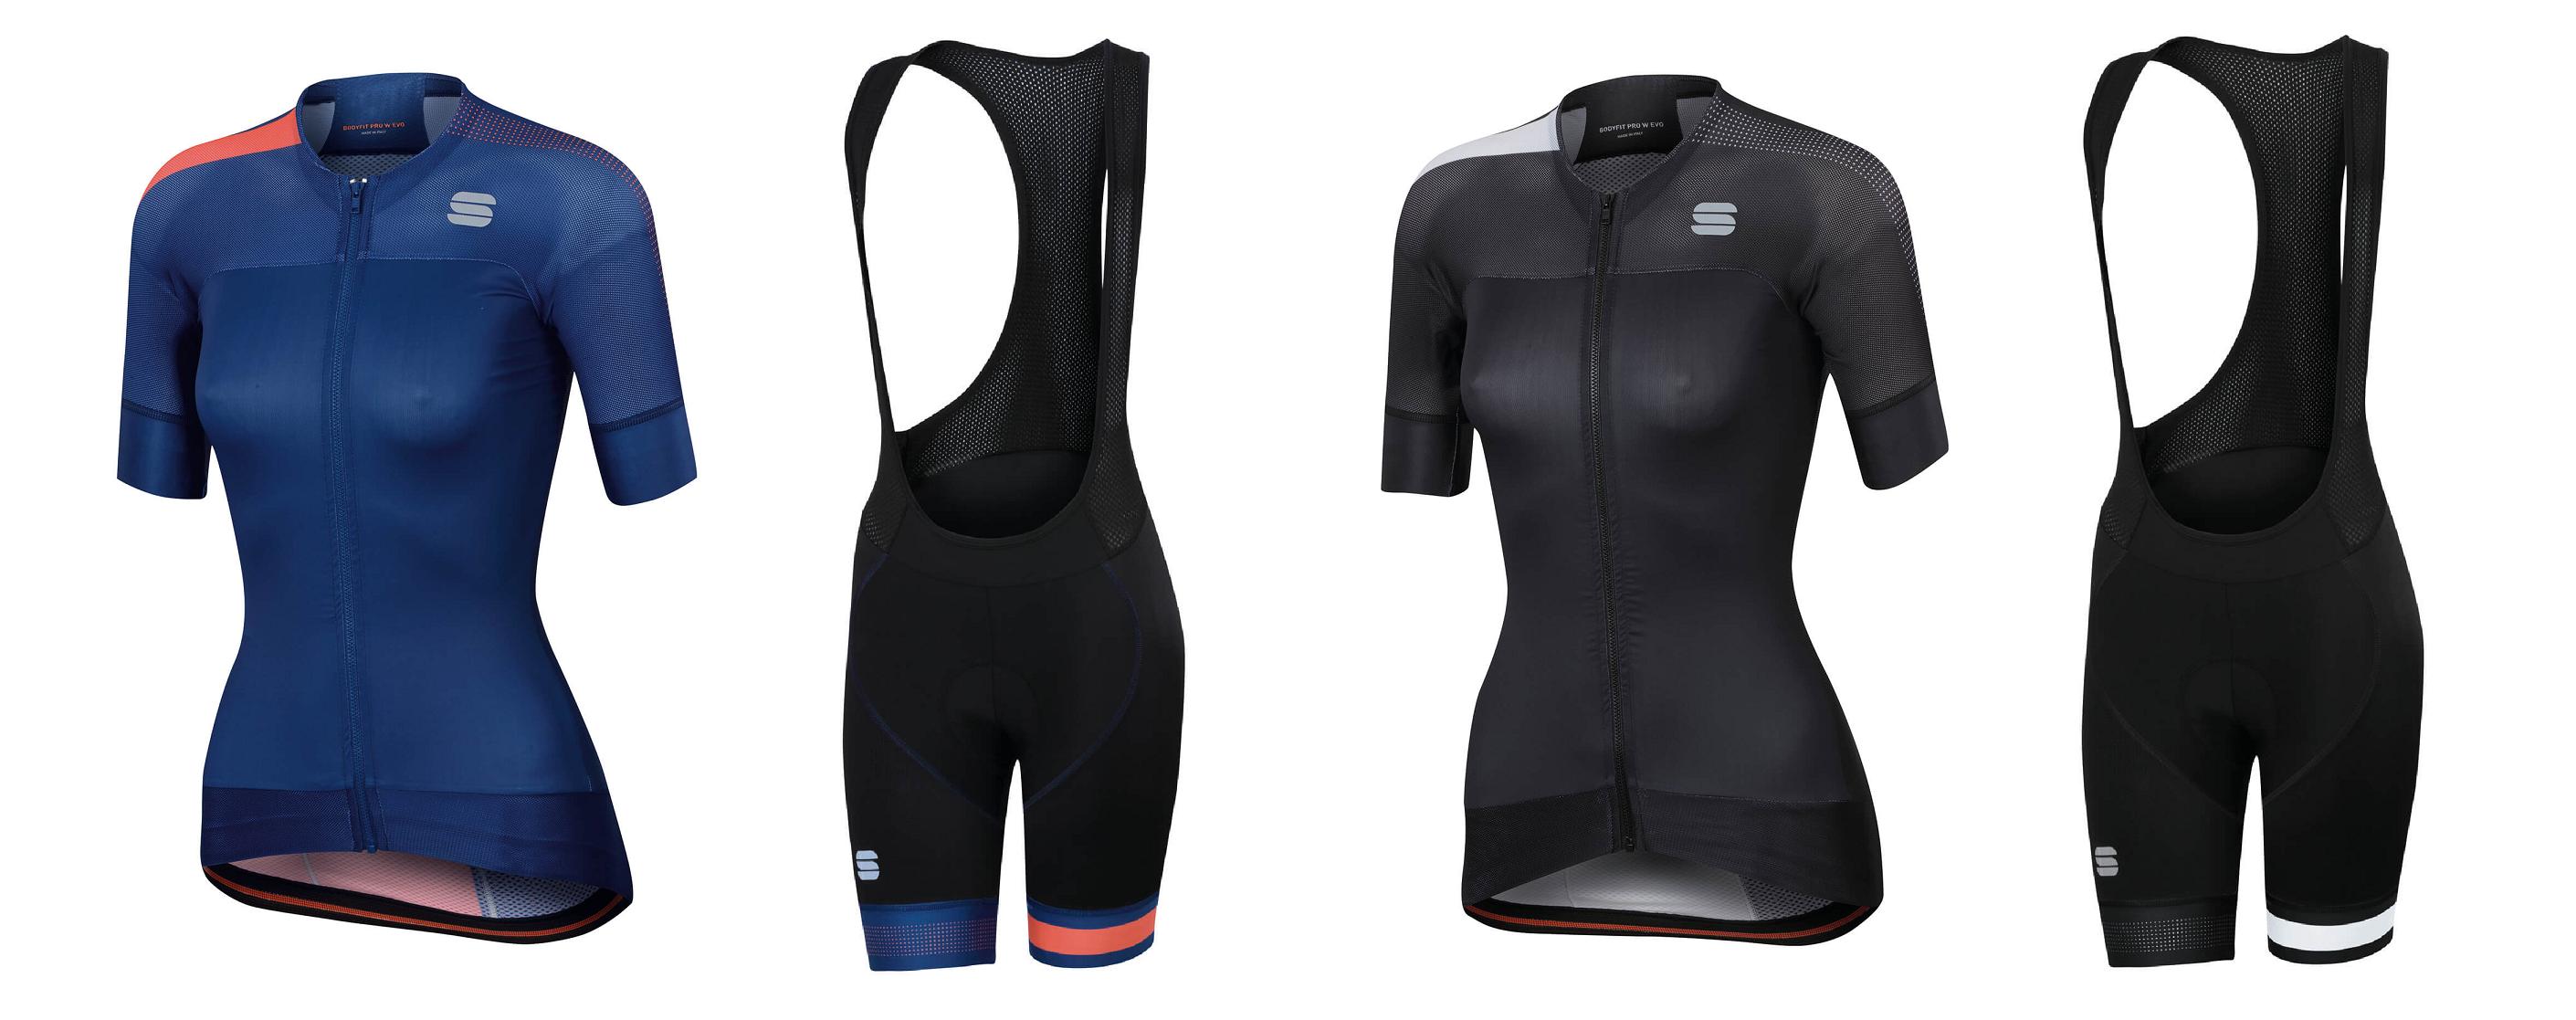 the women's bodyfit pro jersey and short bundle